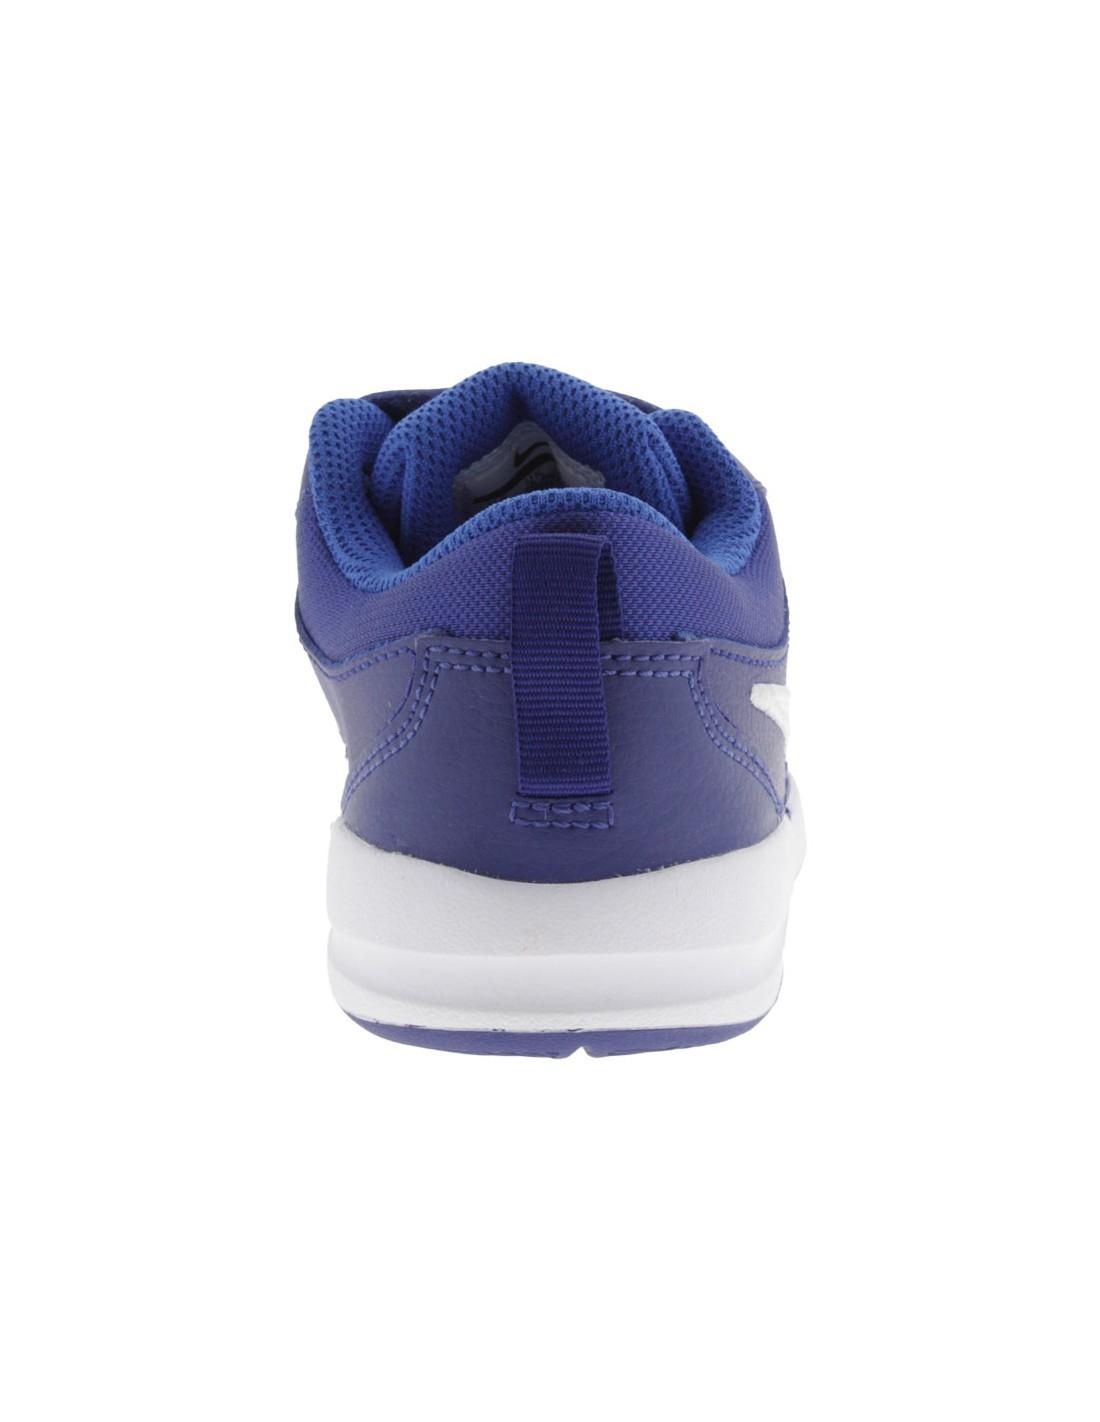 scarpe bambino 12 anni nike